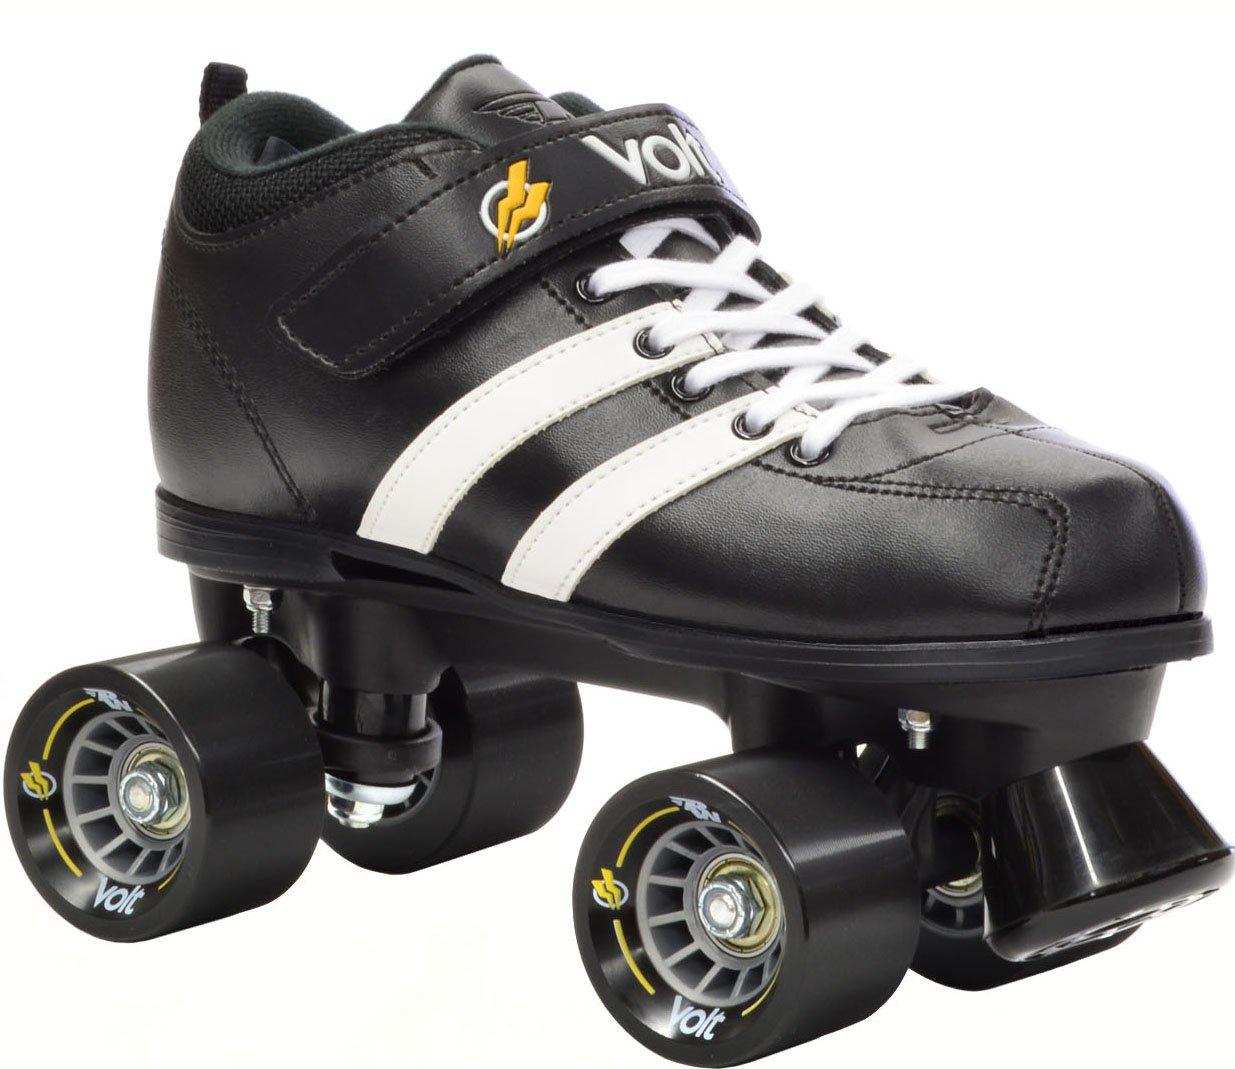 Riedell Volt Skates - Riedell Volt Roller Skates - Volt Speed Skates